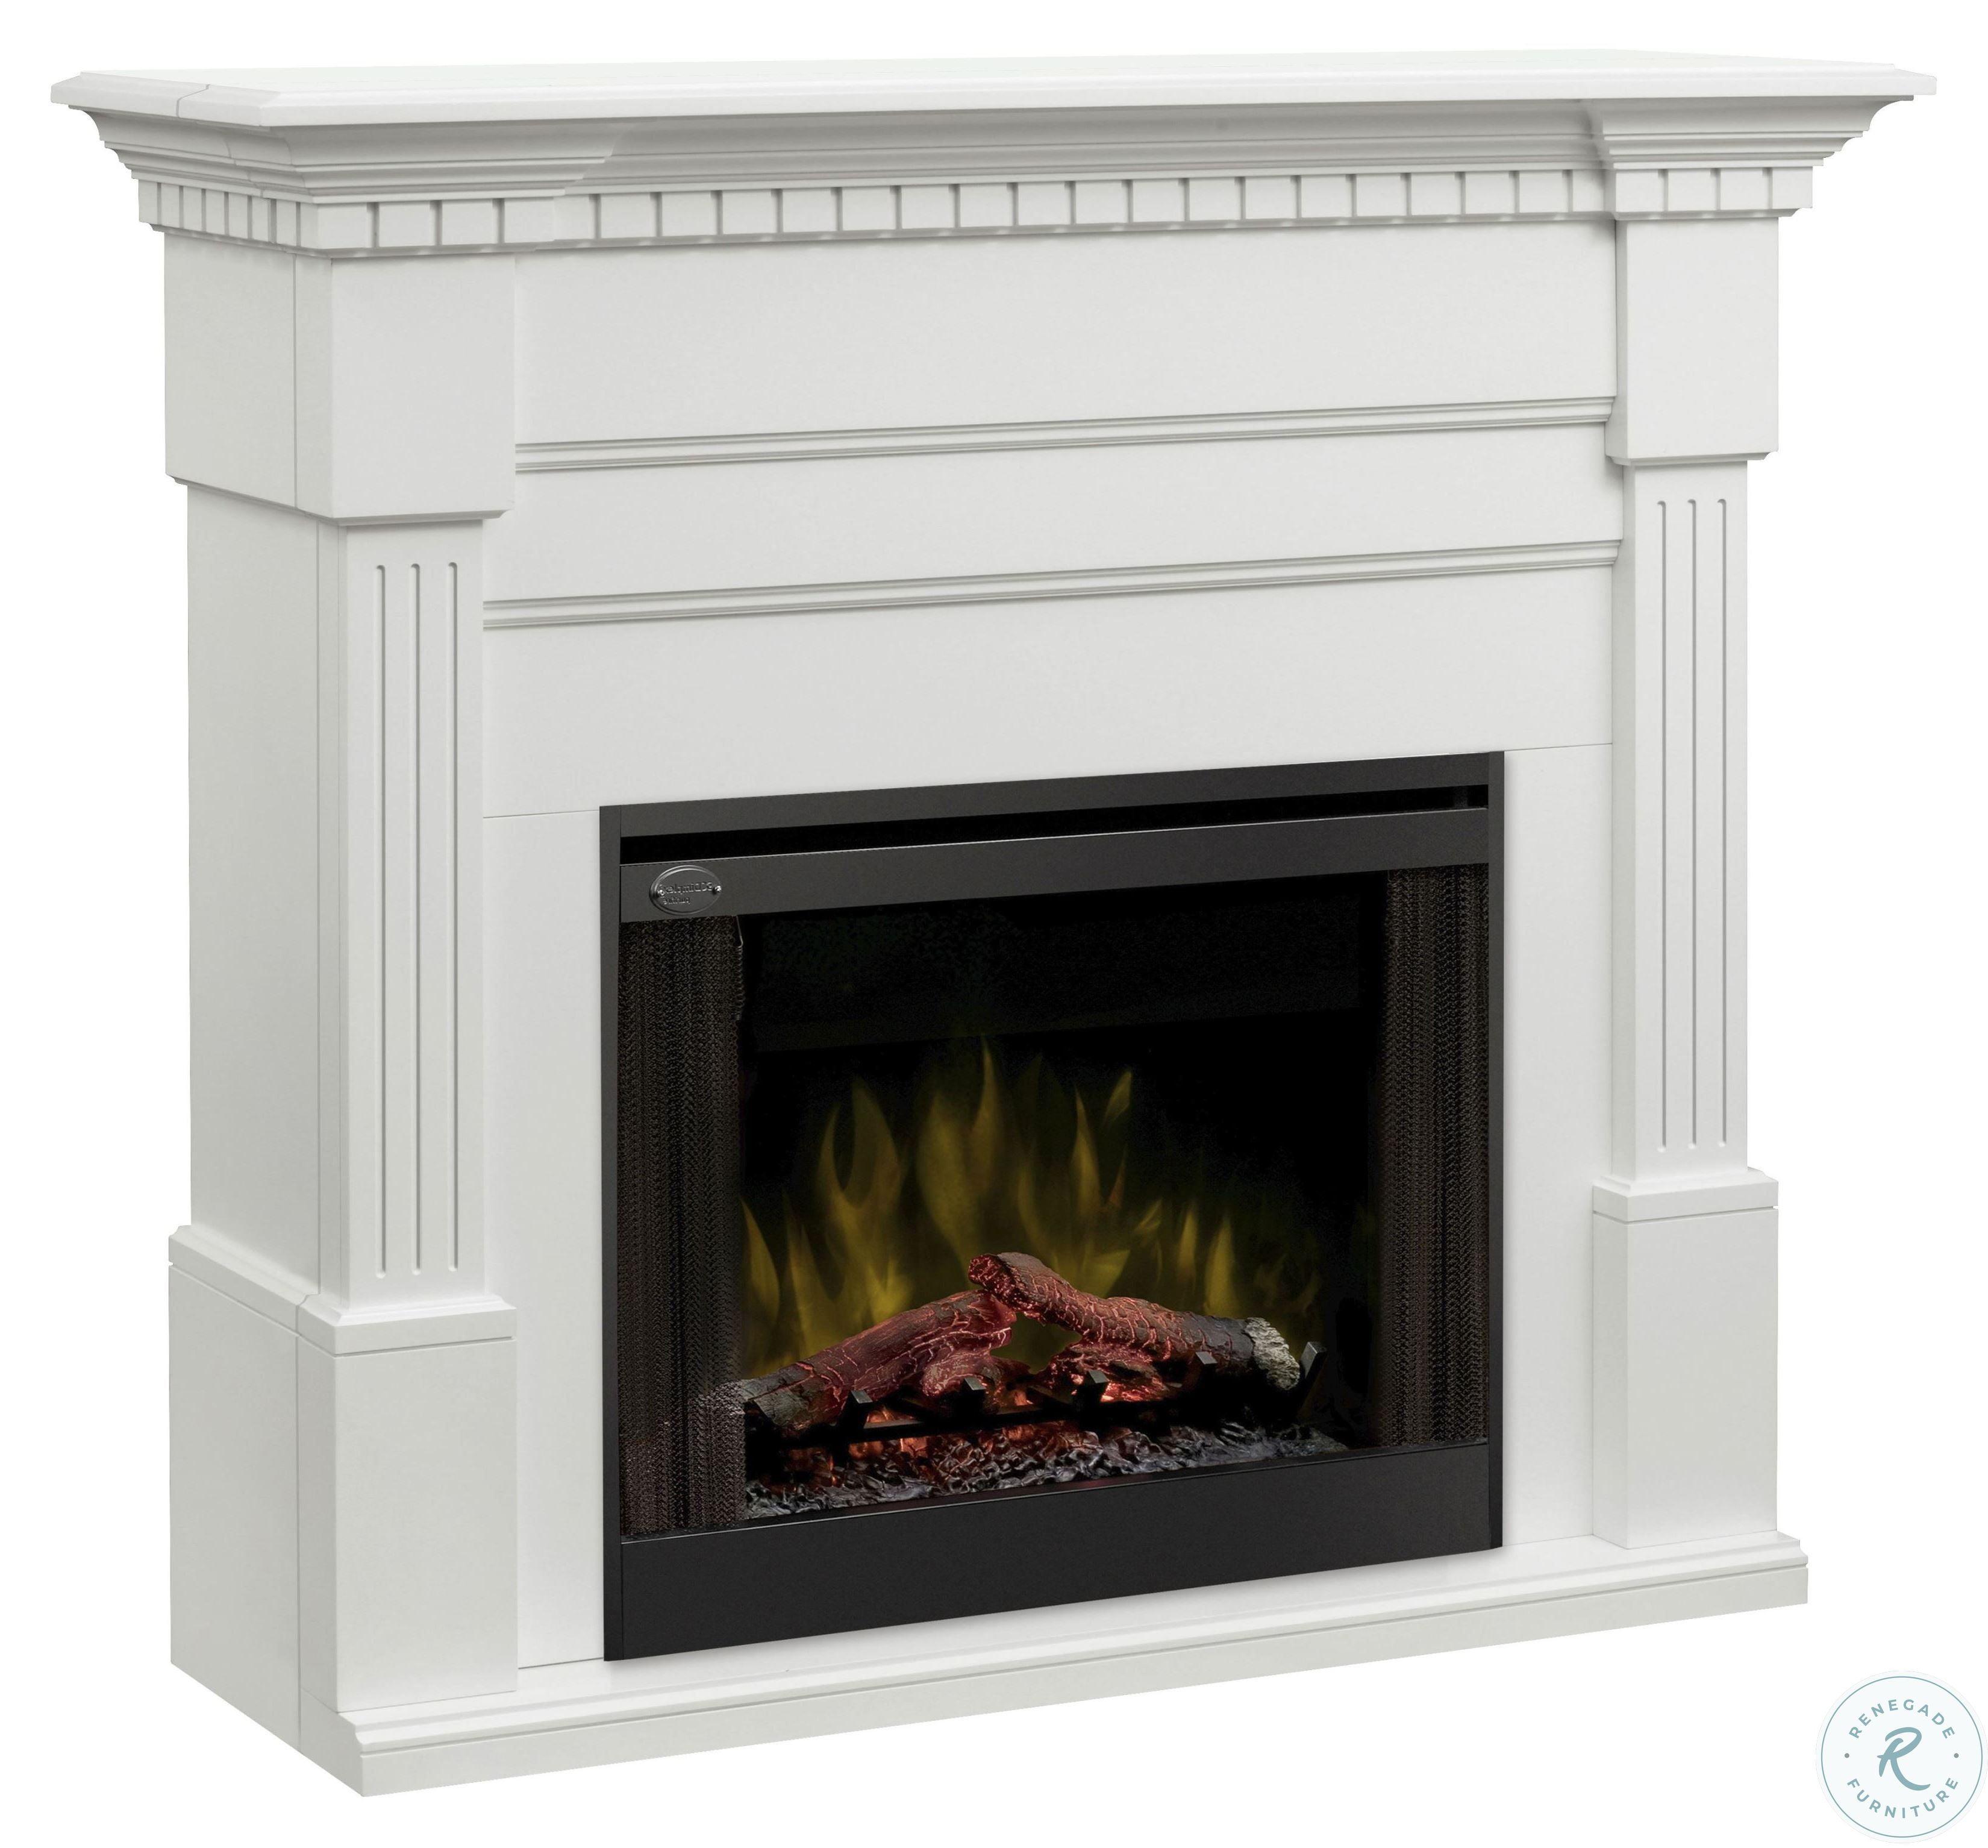 decorative indoor firewood rack outdoor fireplace wood.htm essex white mantel with log set firebox from dimplex coleman  essex white mantel with log set firebox